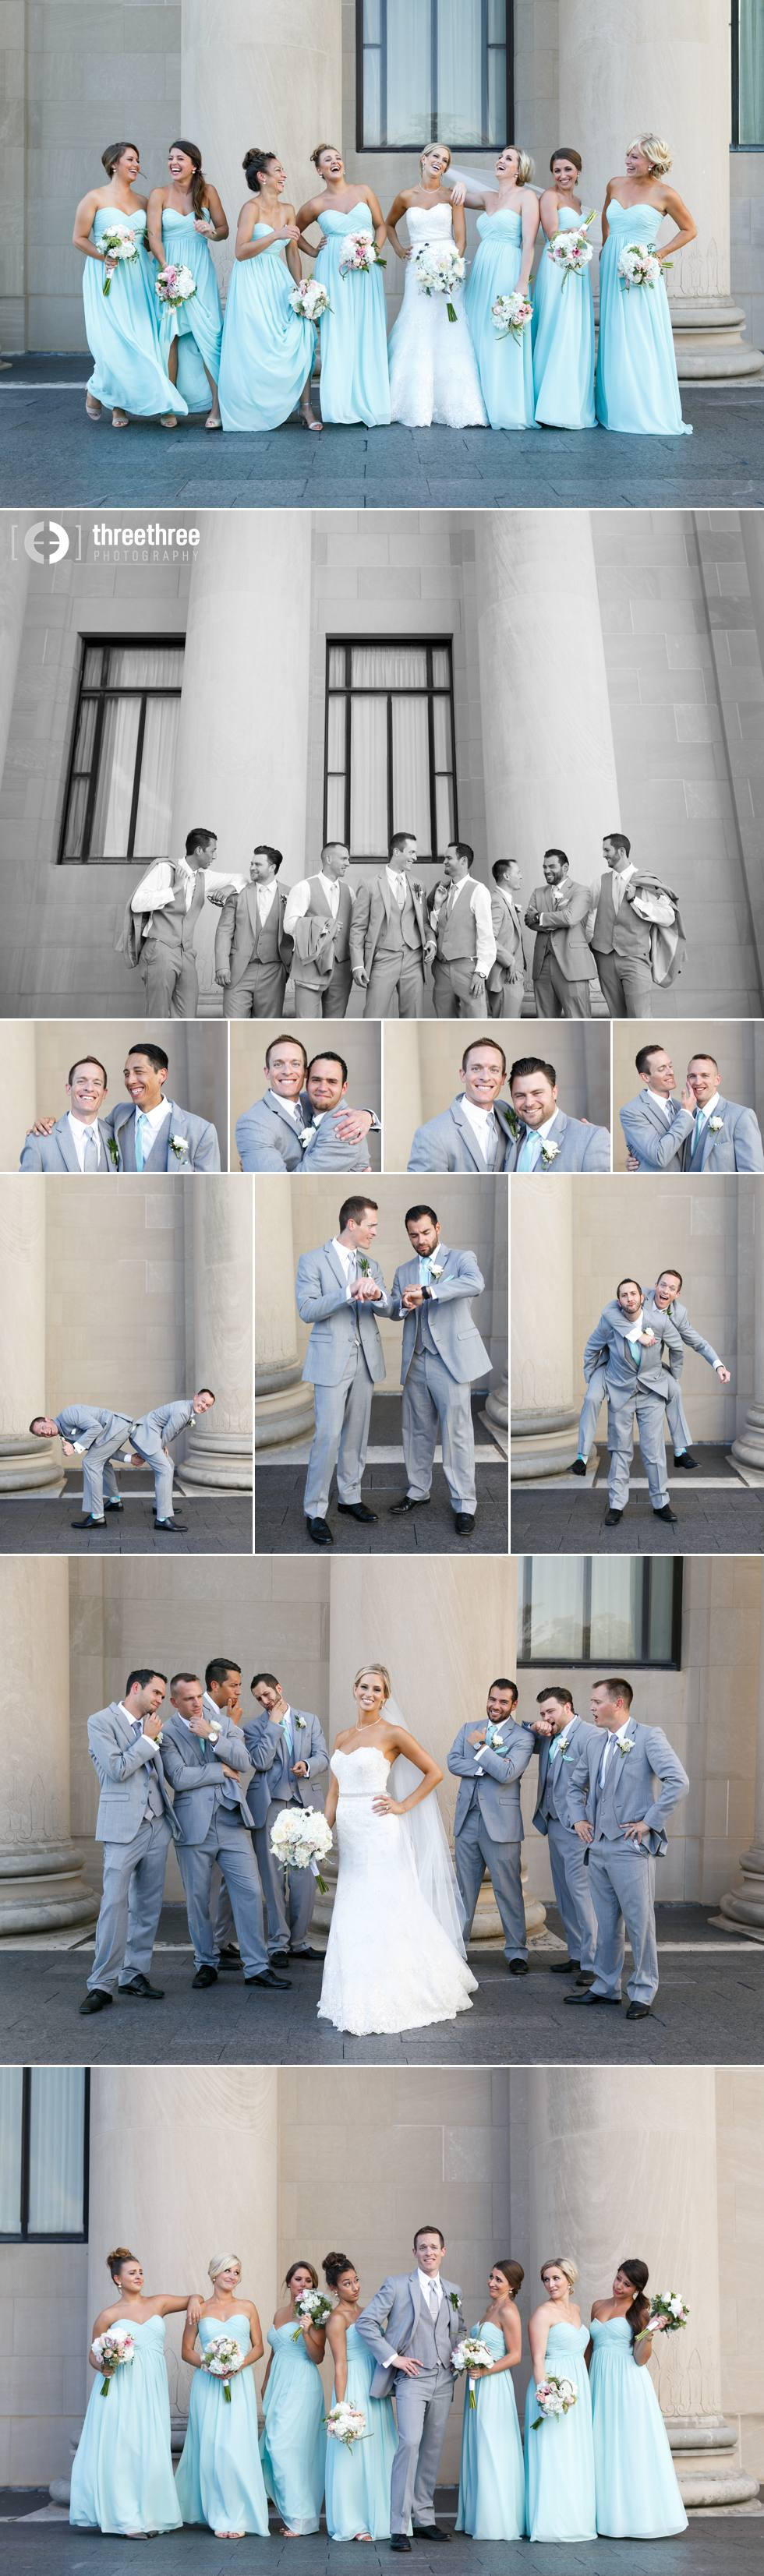 Natalie_AJ_wedding 10